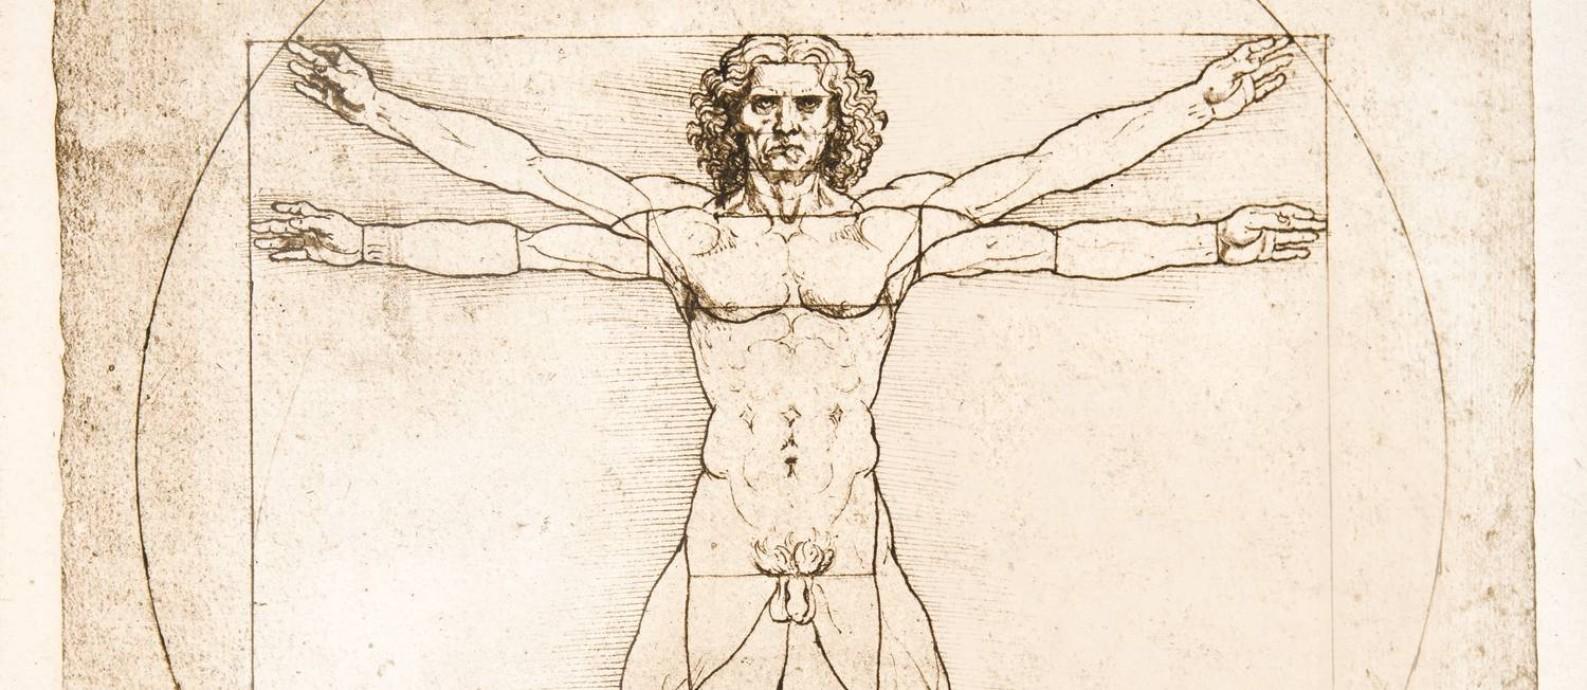 Homem Vitruviano, de Leonardo Da Vinci Foto: The Stapleton Collection / www.bridgemanimages.com